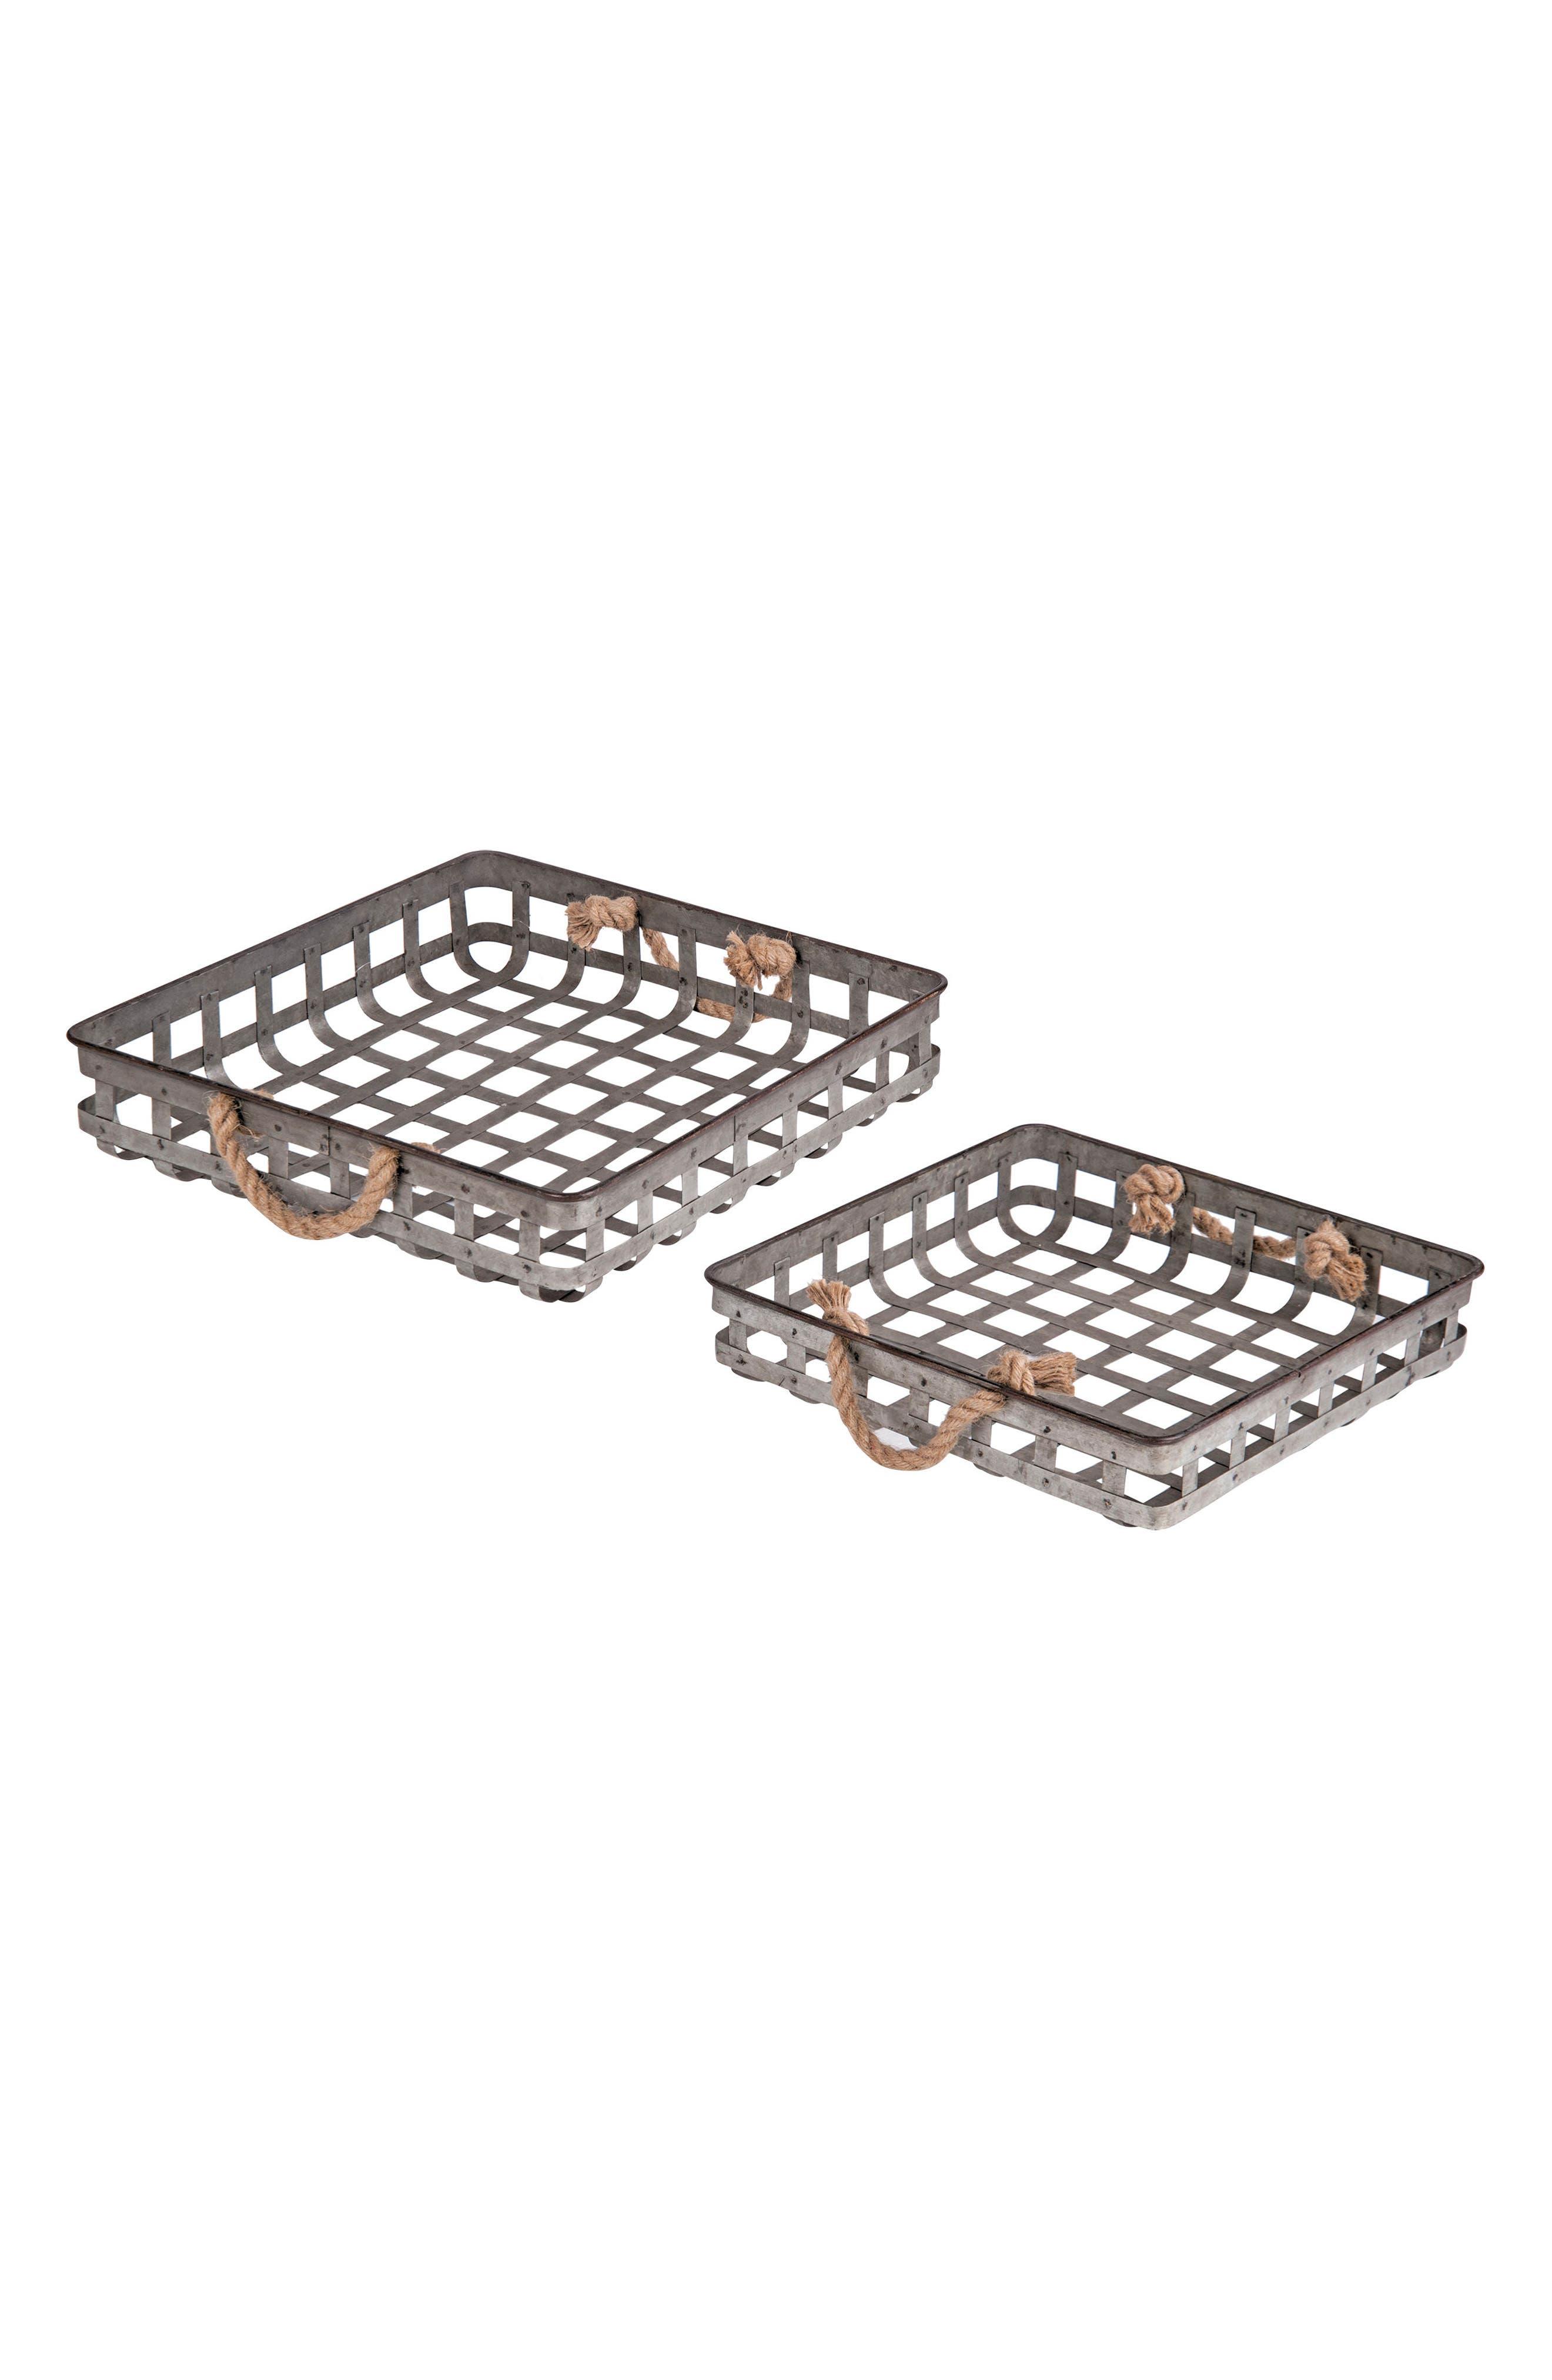 Set of 2 Nesting Basket Trays,                         Main,                         color, Metal/ Rope